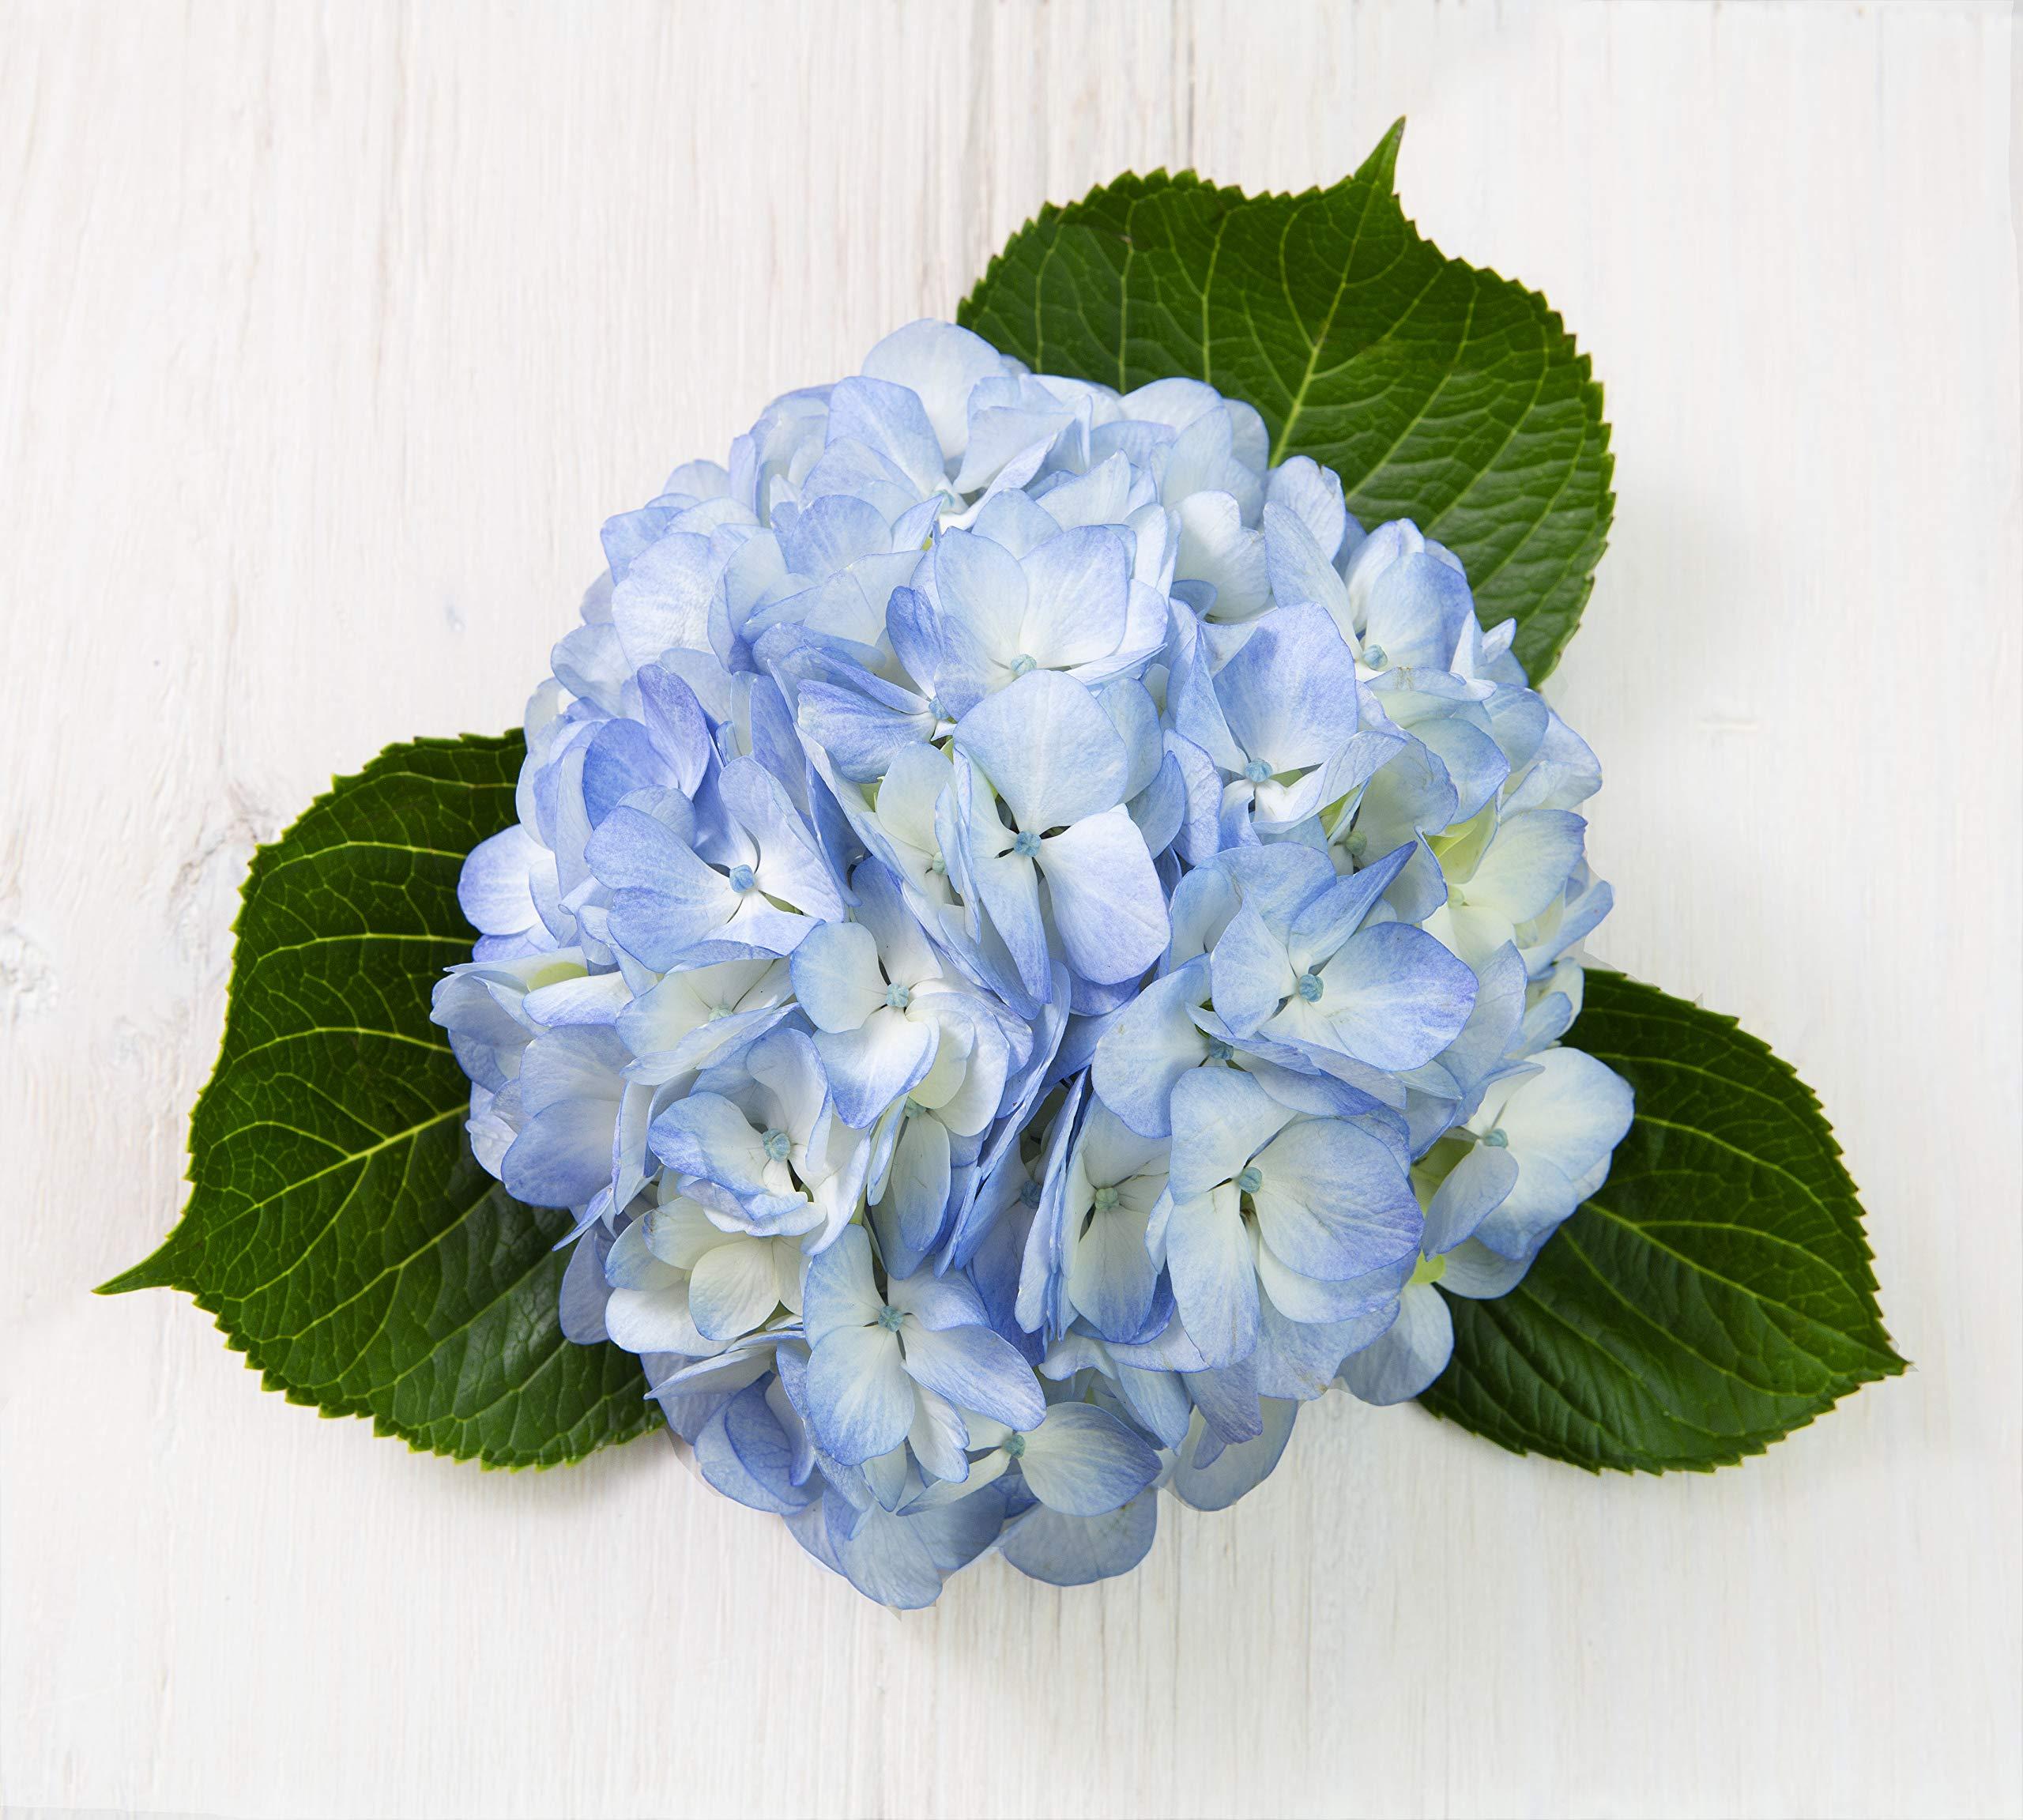 Blooms2Door 30 Blue Hydrangeas (Farm-Fresh, Naturally Colored, Premium Quality) by Blooms2Door (Image #6)